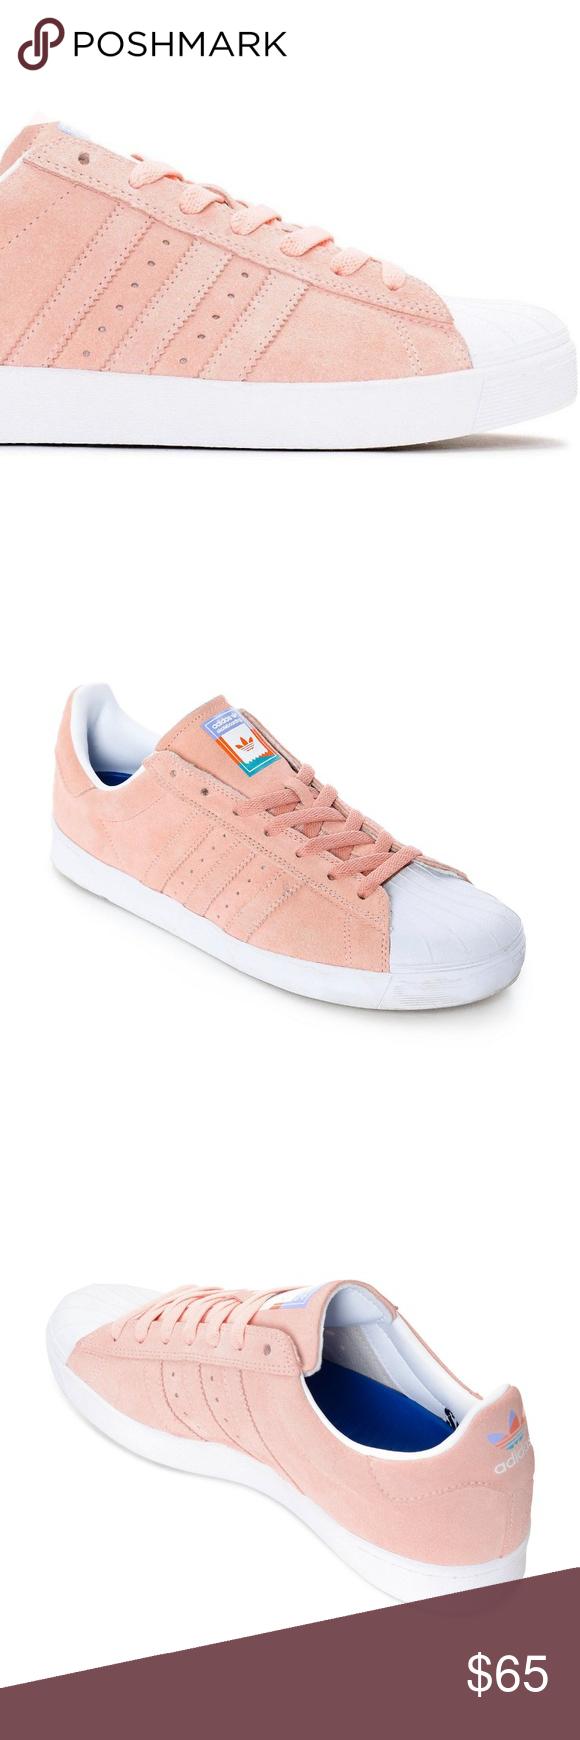 Zapatillas Adidas | 19202 8 Superstar Vulc Pink para mujer Sz 8 NWT | 4f1c86c - colja.host